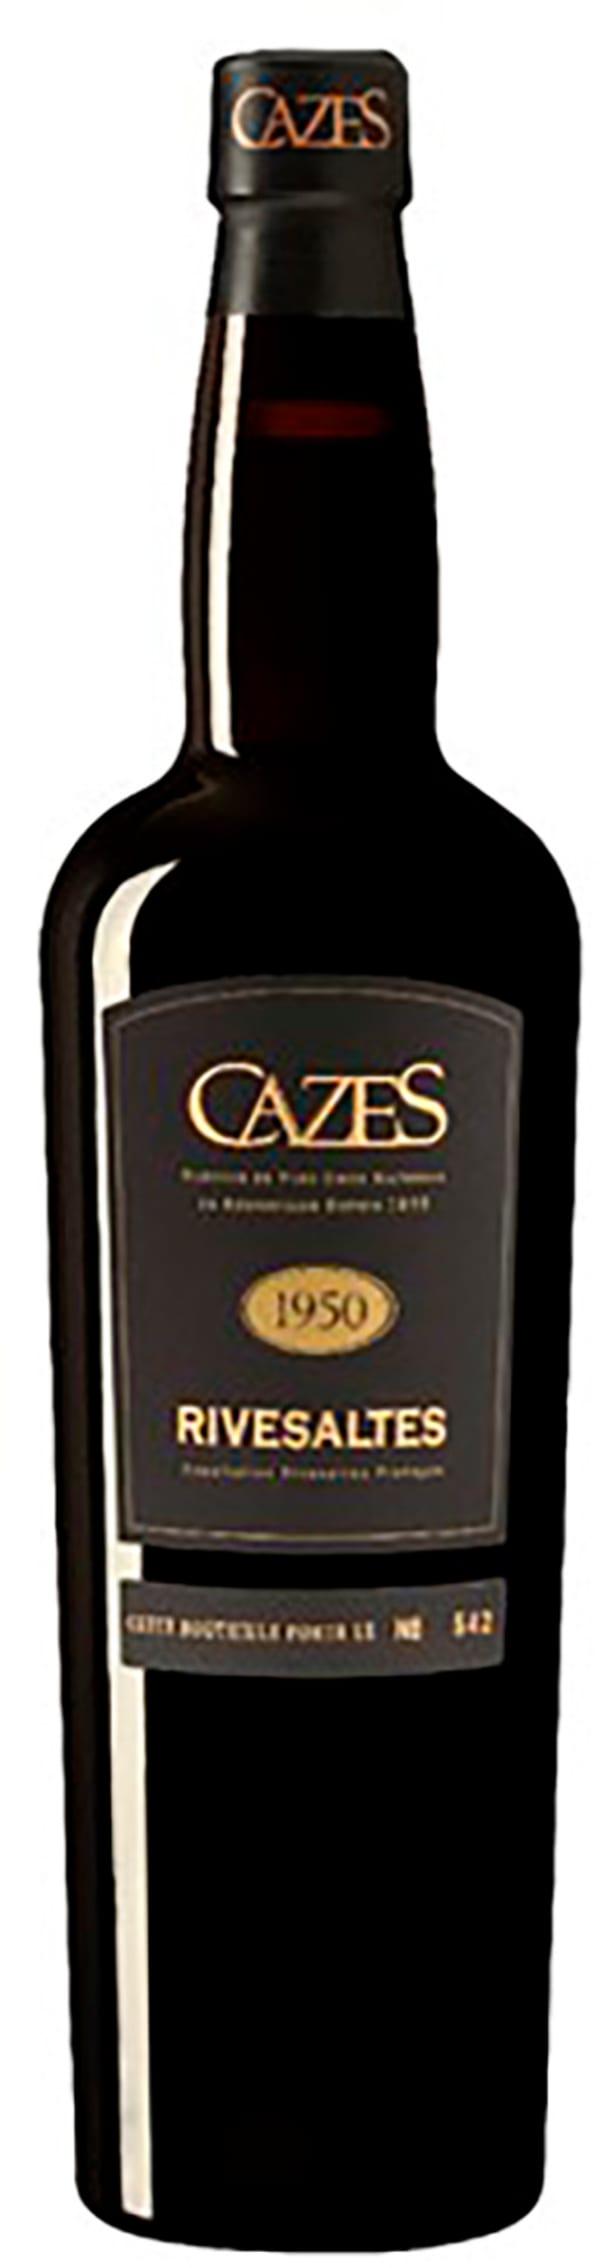 Cazes Rivesaltes 1950